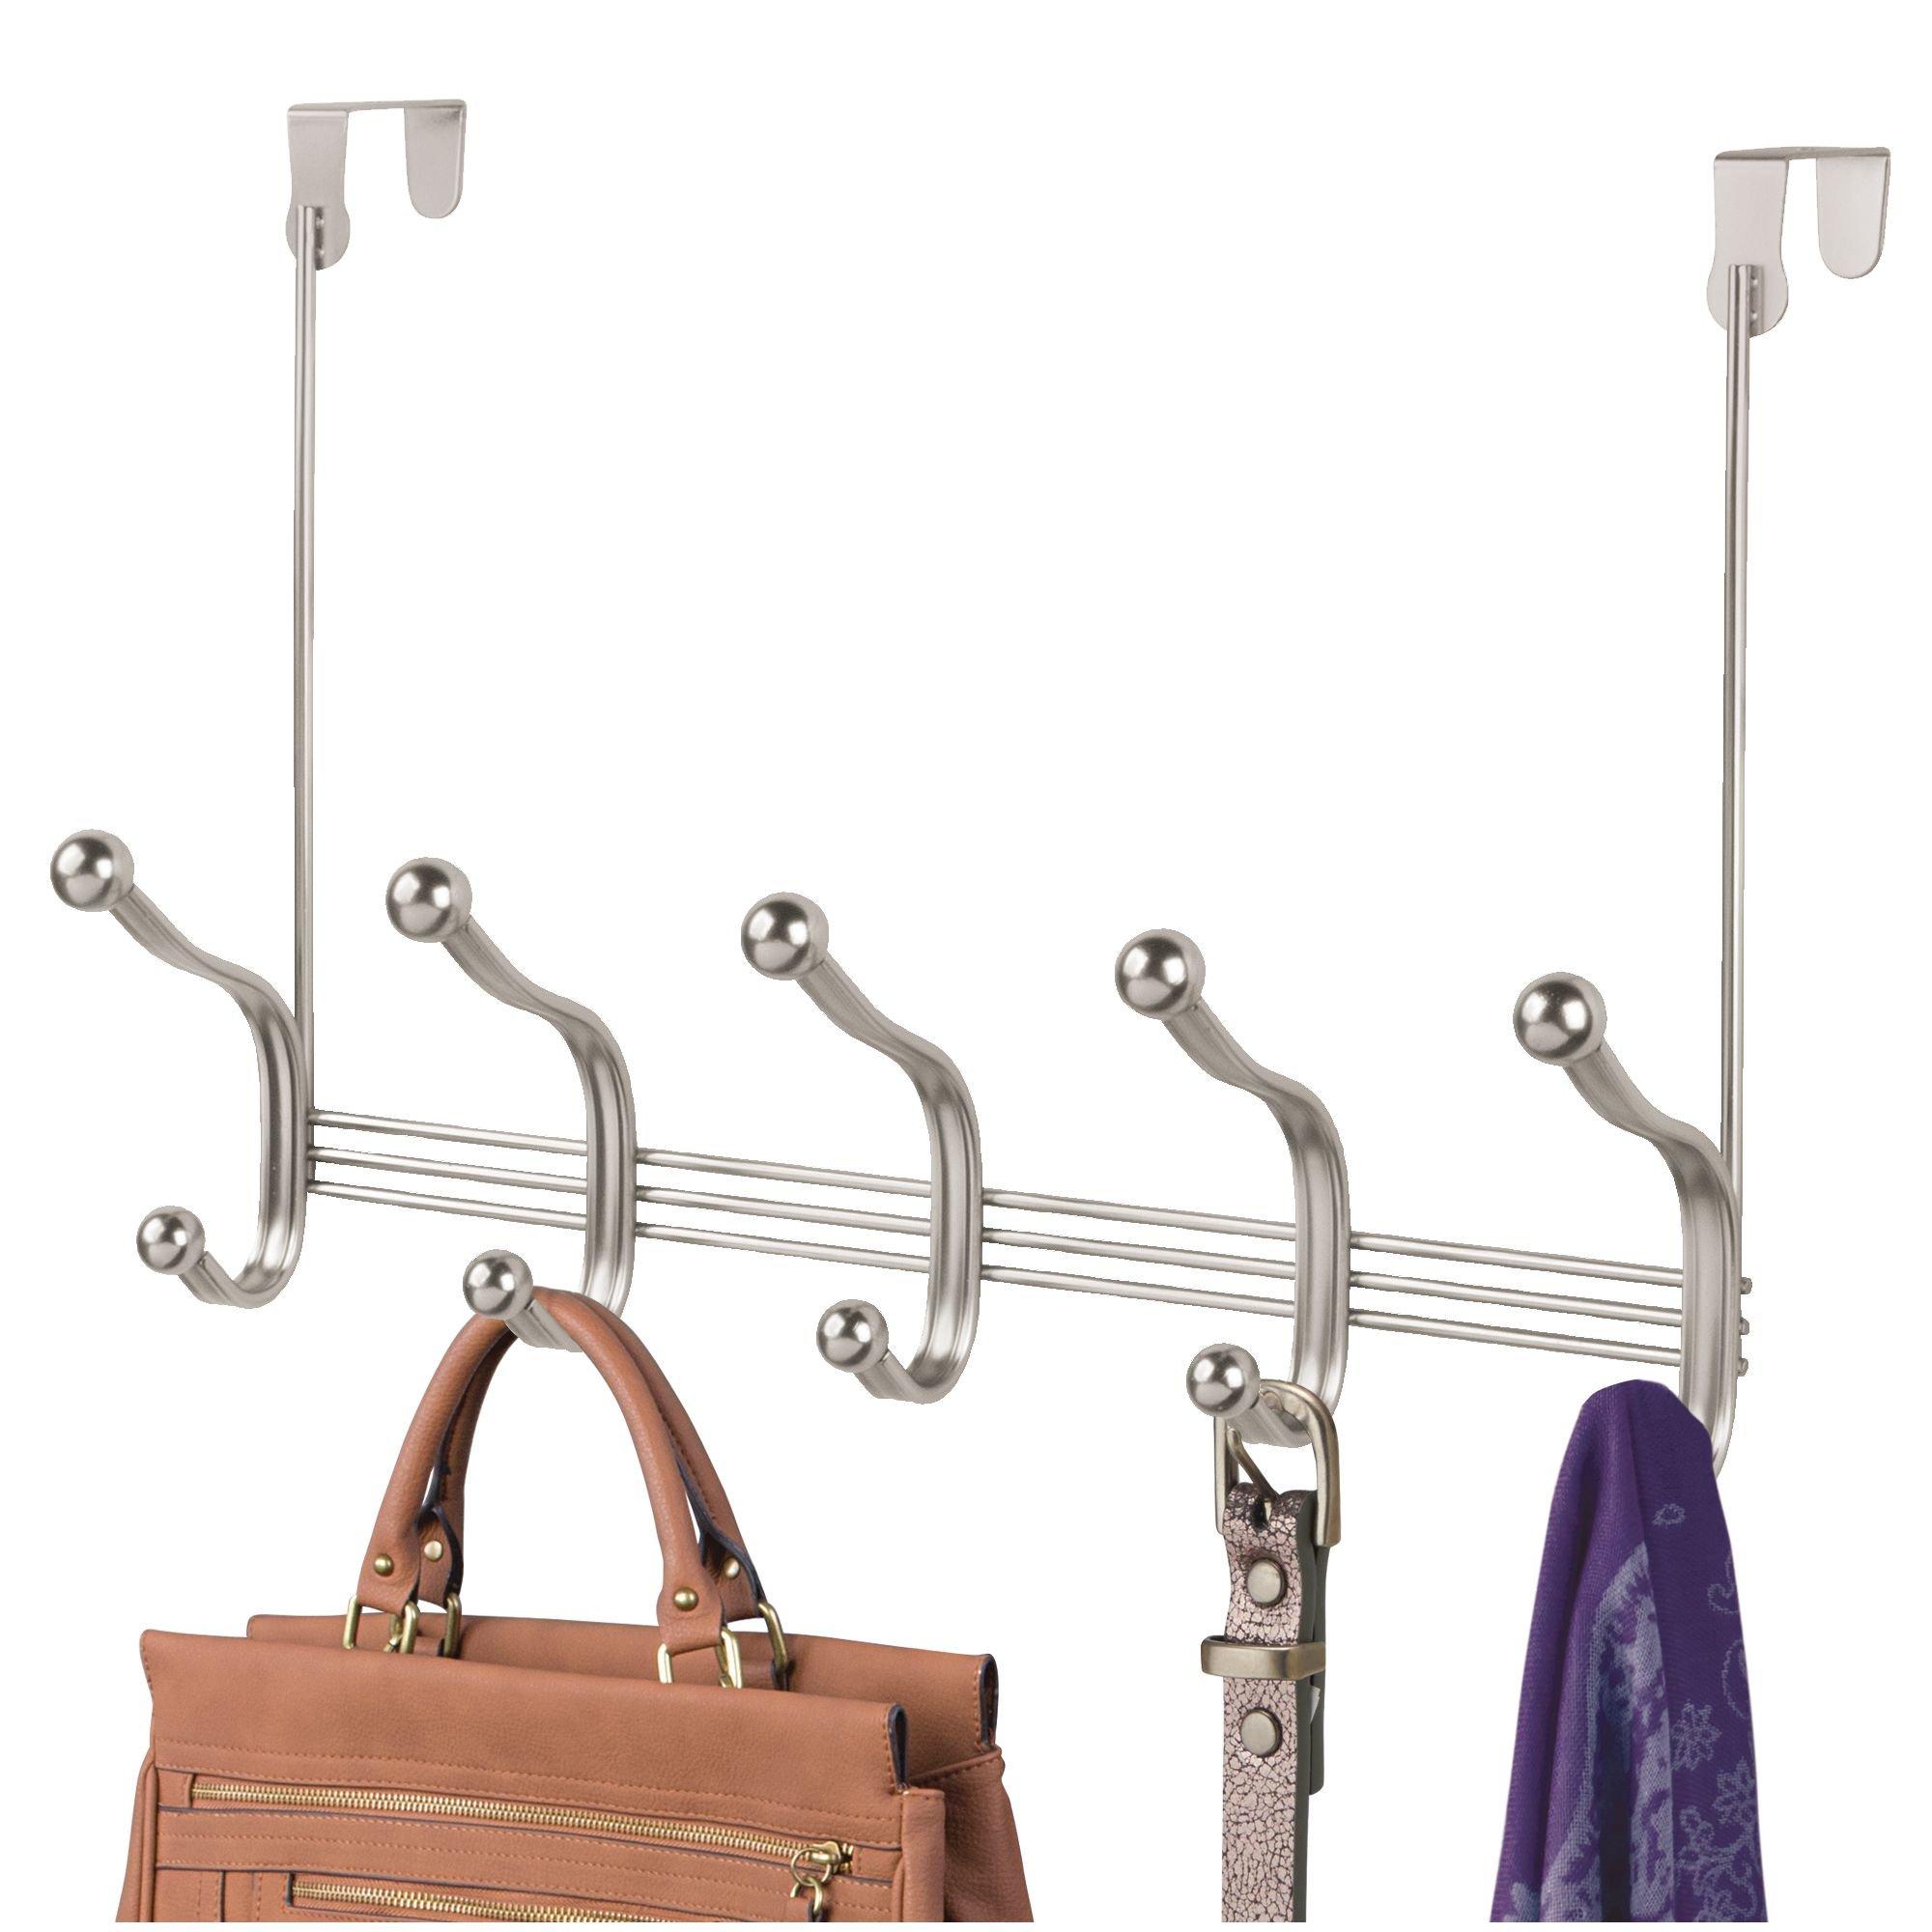 mDesign Over Door 10 Hook Steel Storage Organizer Rack for Coats, Hoodies, Hats, Scarves, Purses, Leashes, Bath Towels & Robes - Brushed Nickel